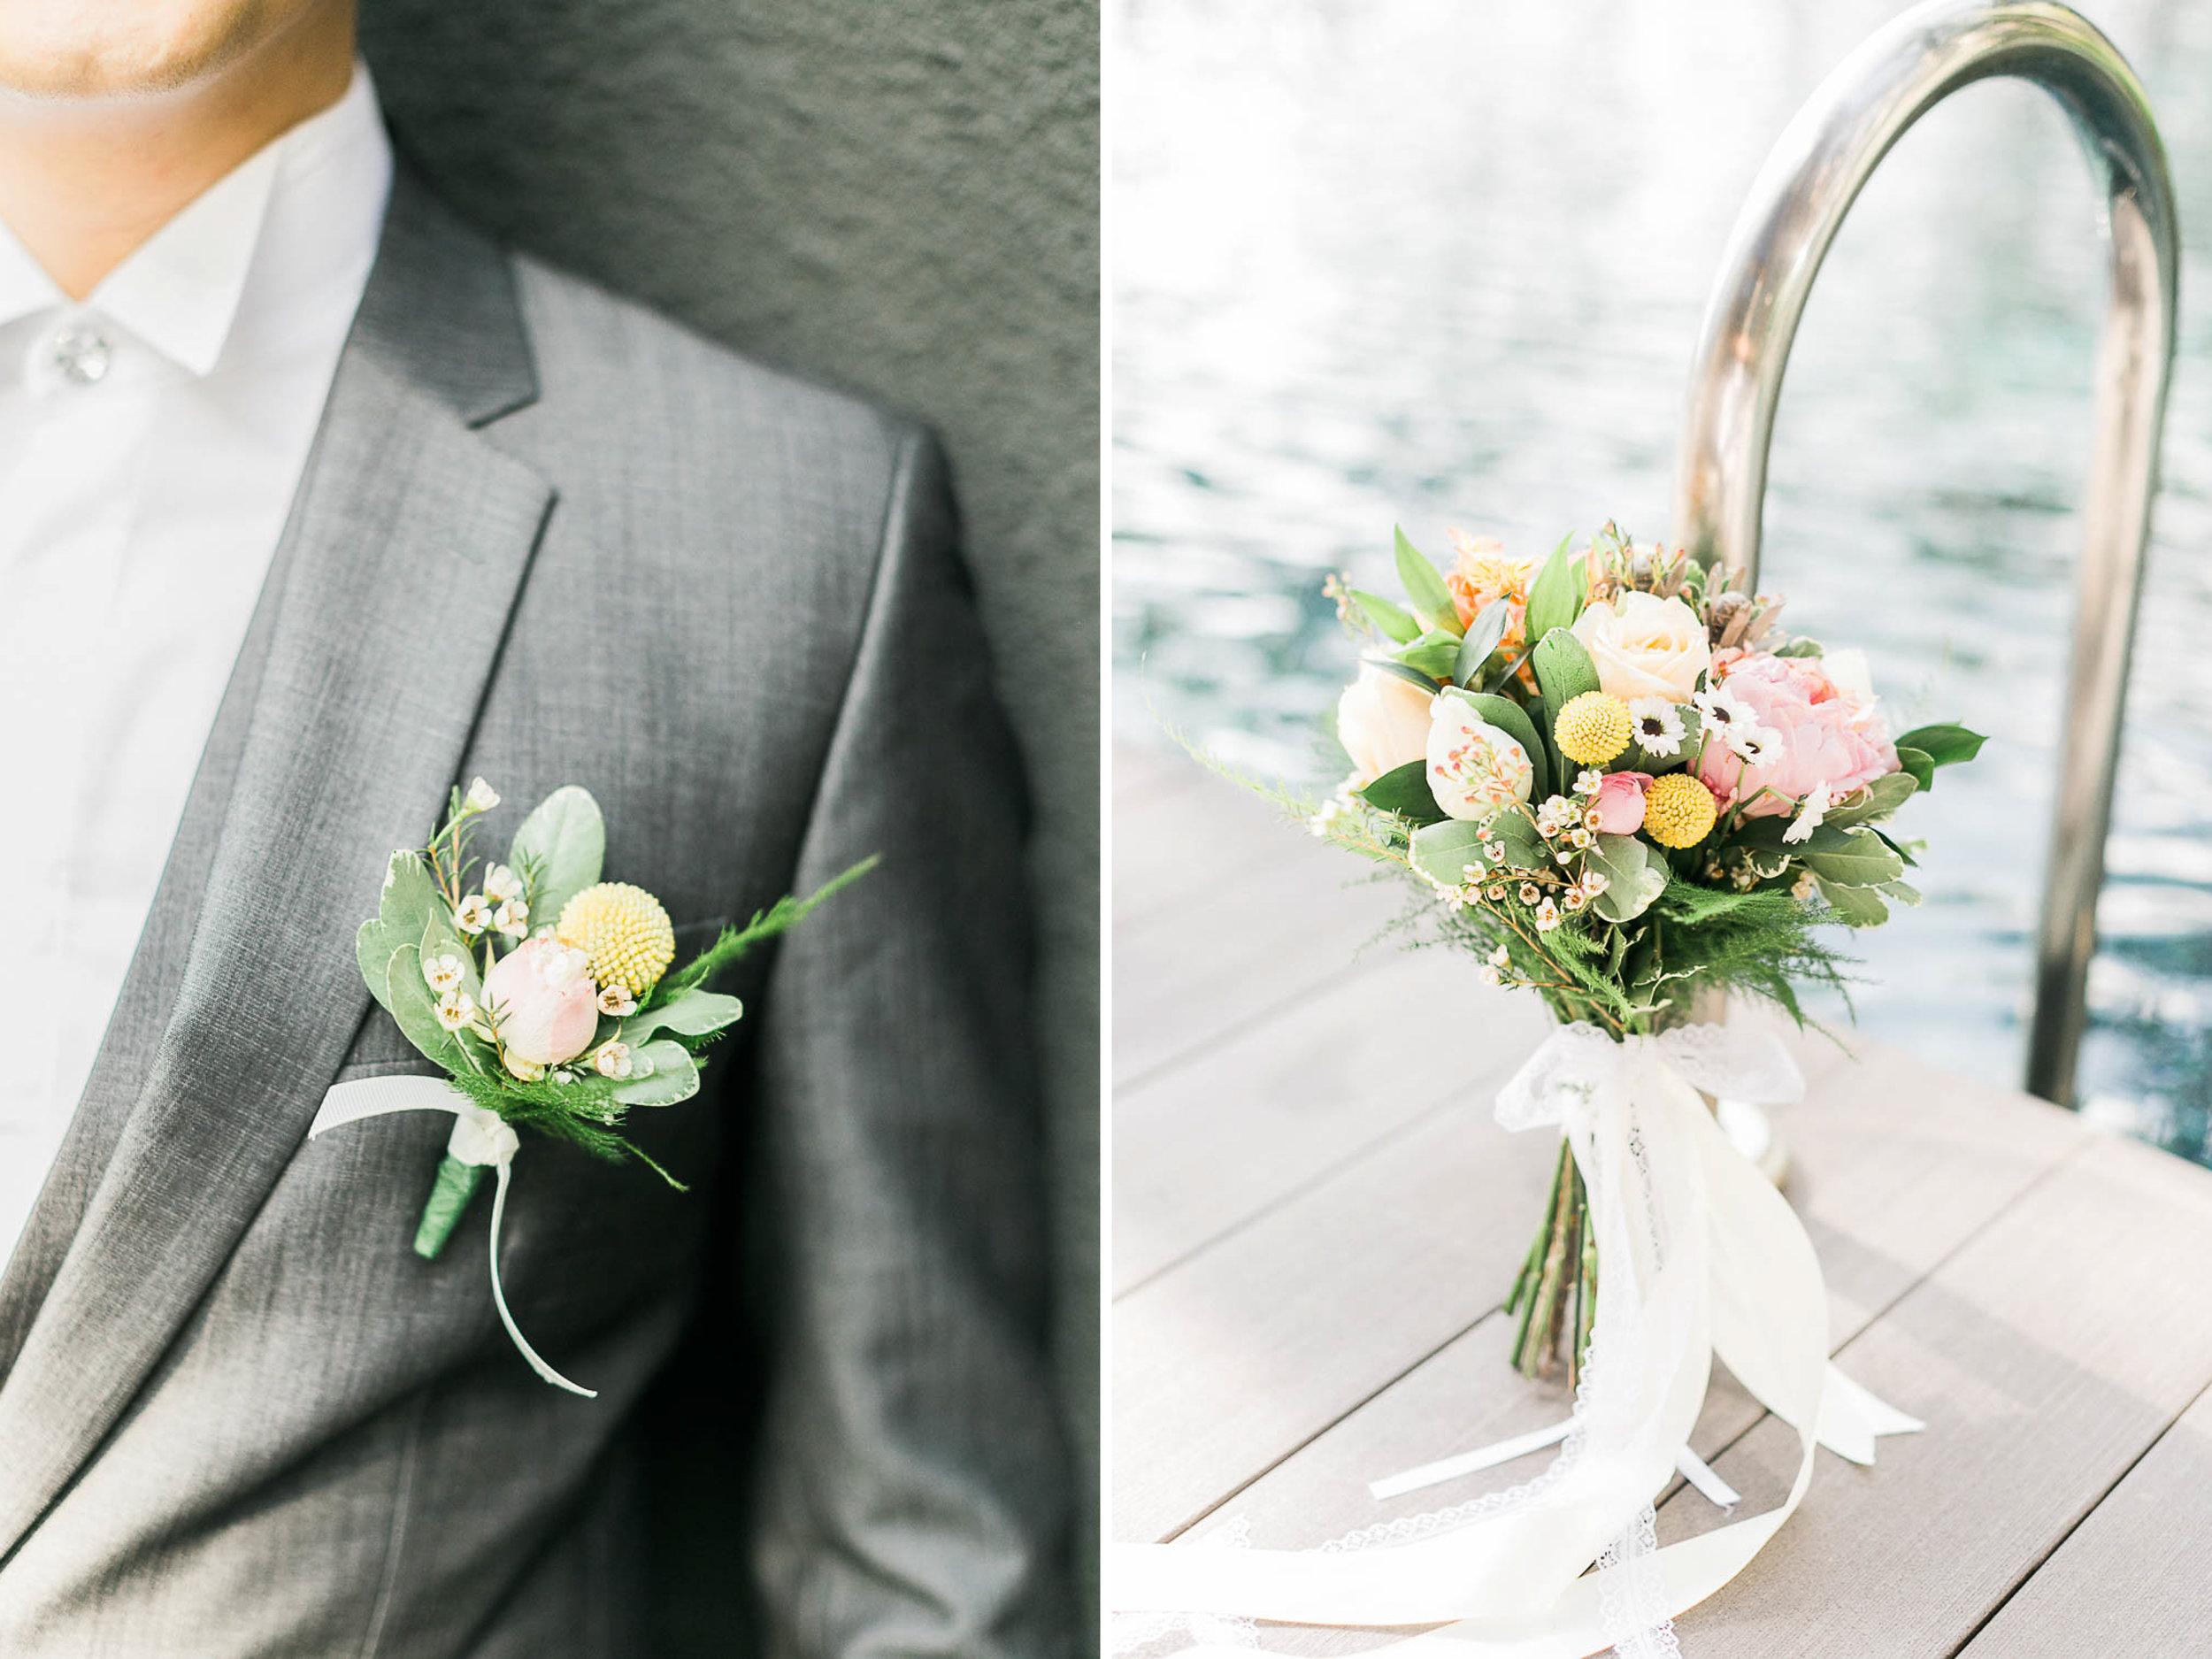 wedding-photographer-singapore-film-photographer-chen-sands-MinKang-wedding-6.jpg